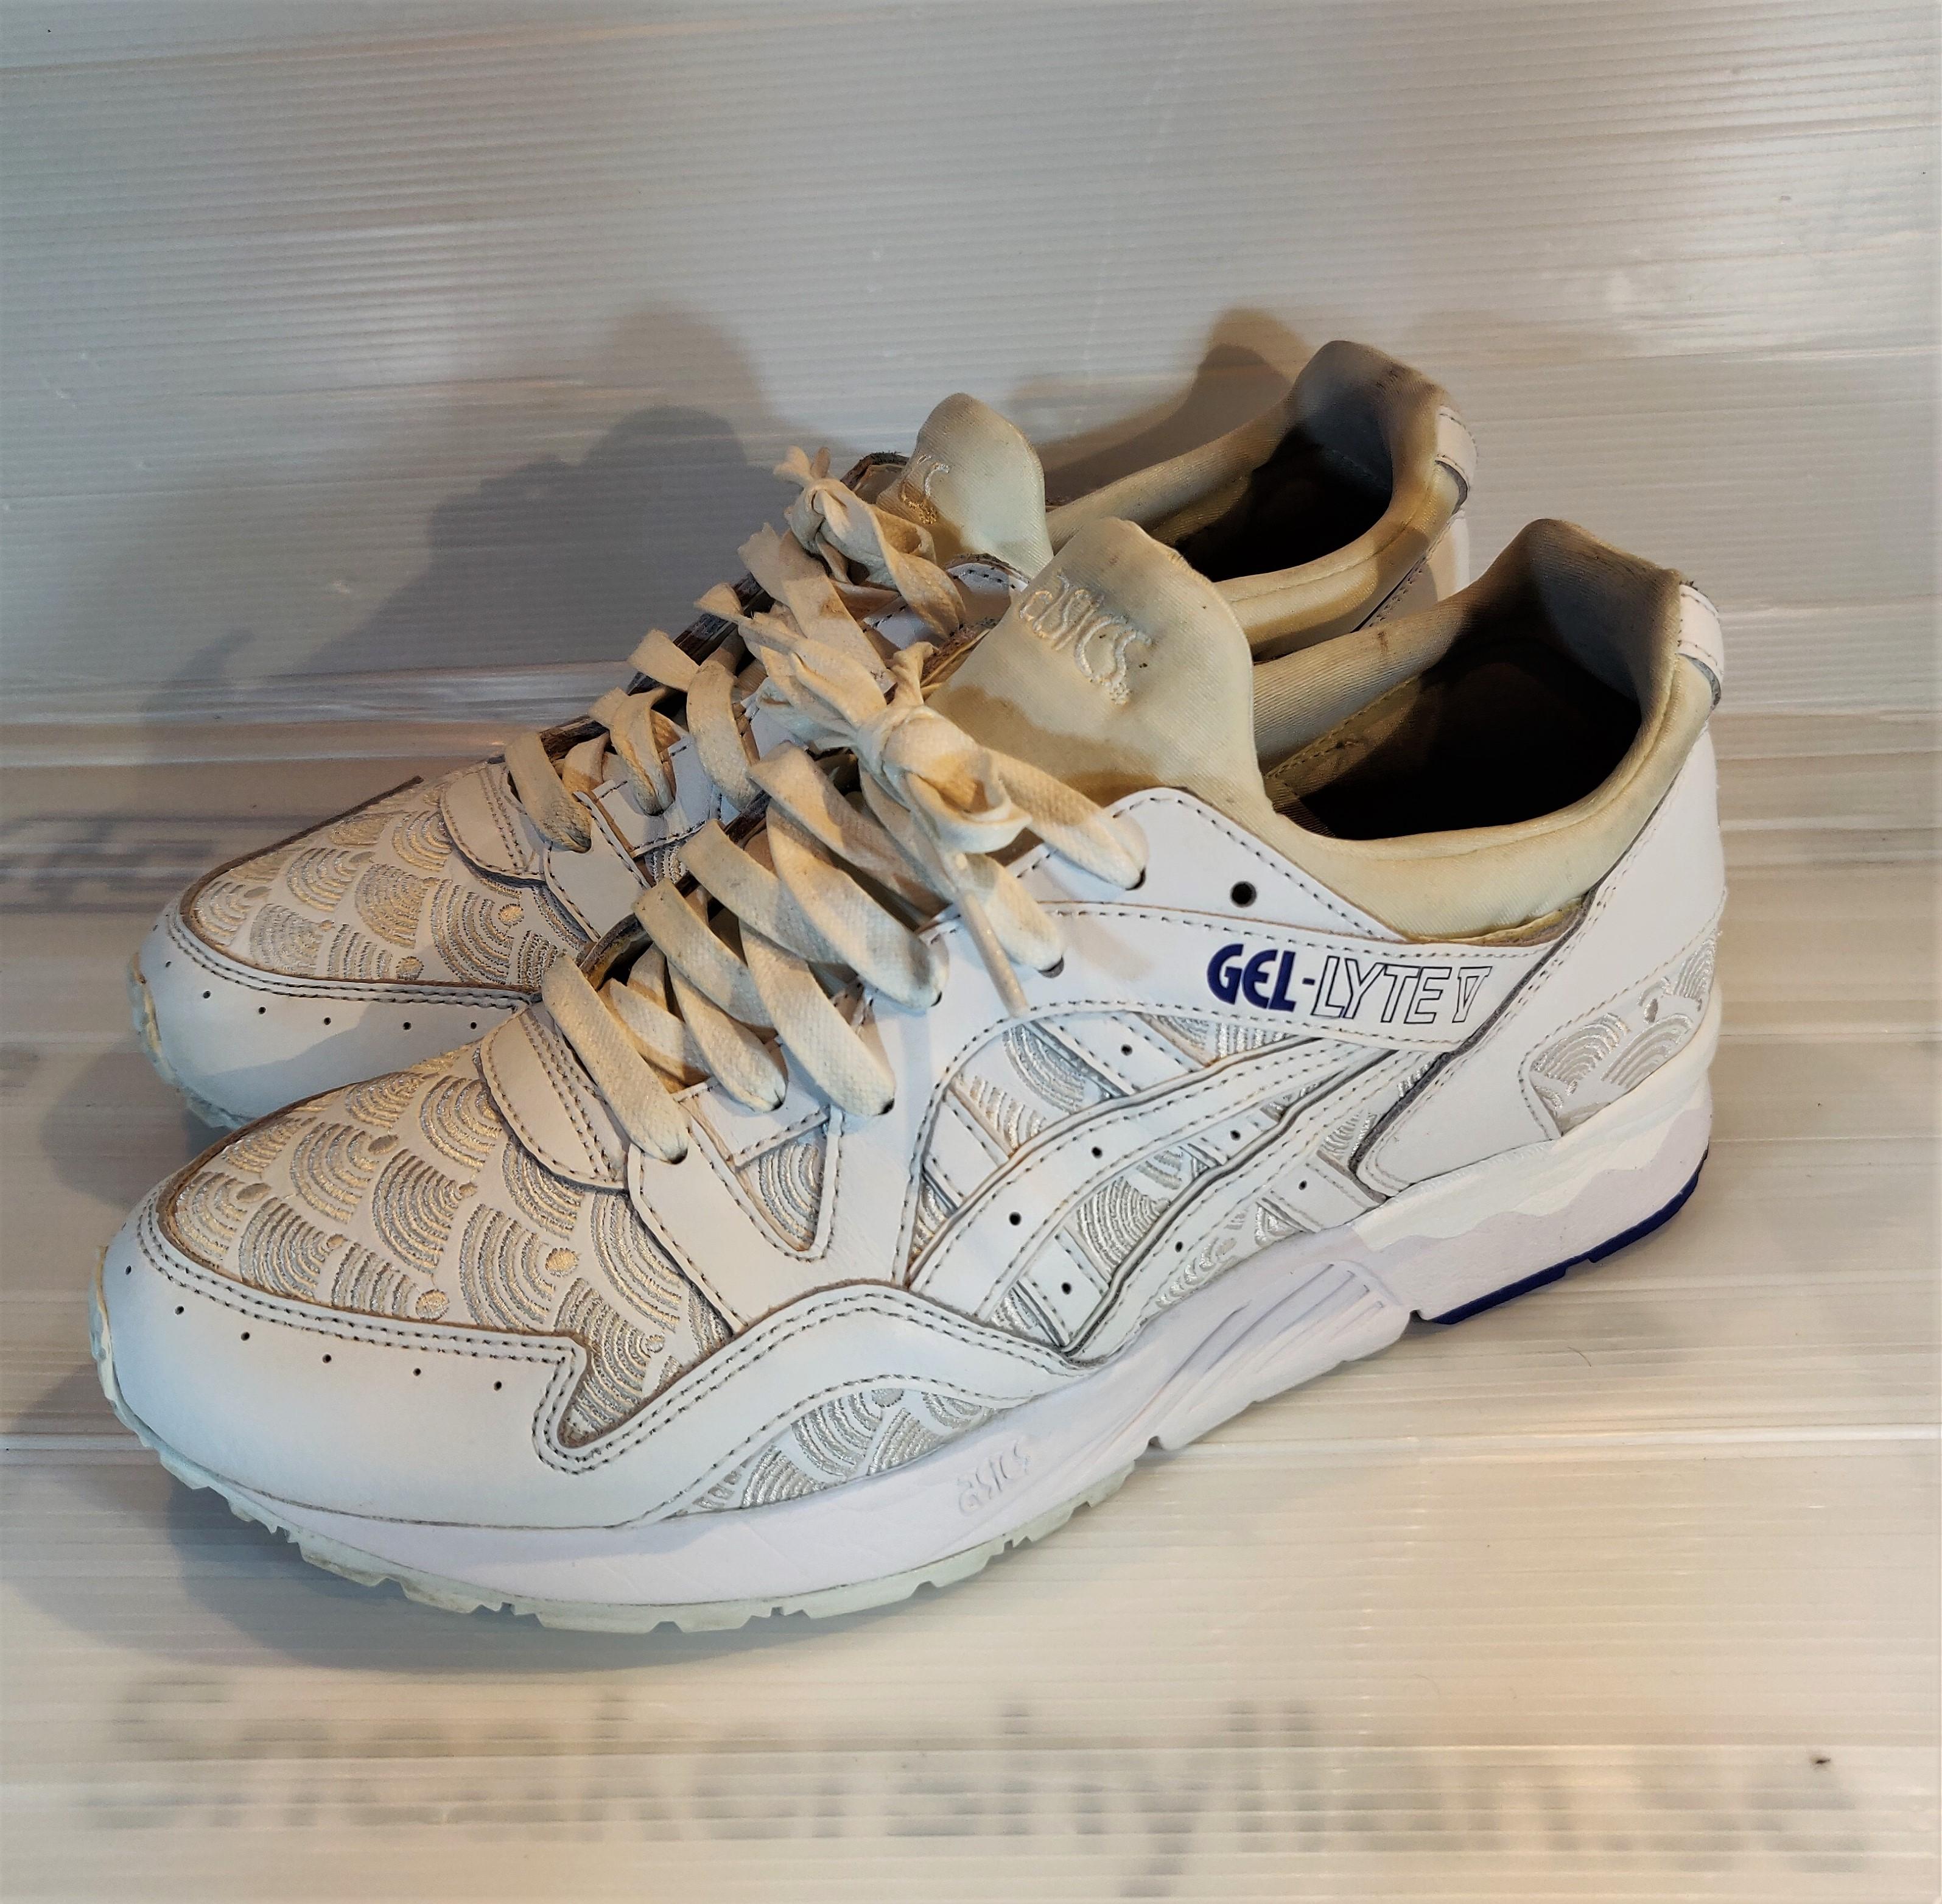 ASICS Gel-Lyte V Colette White Yukata